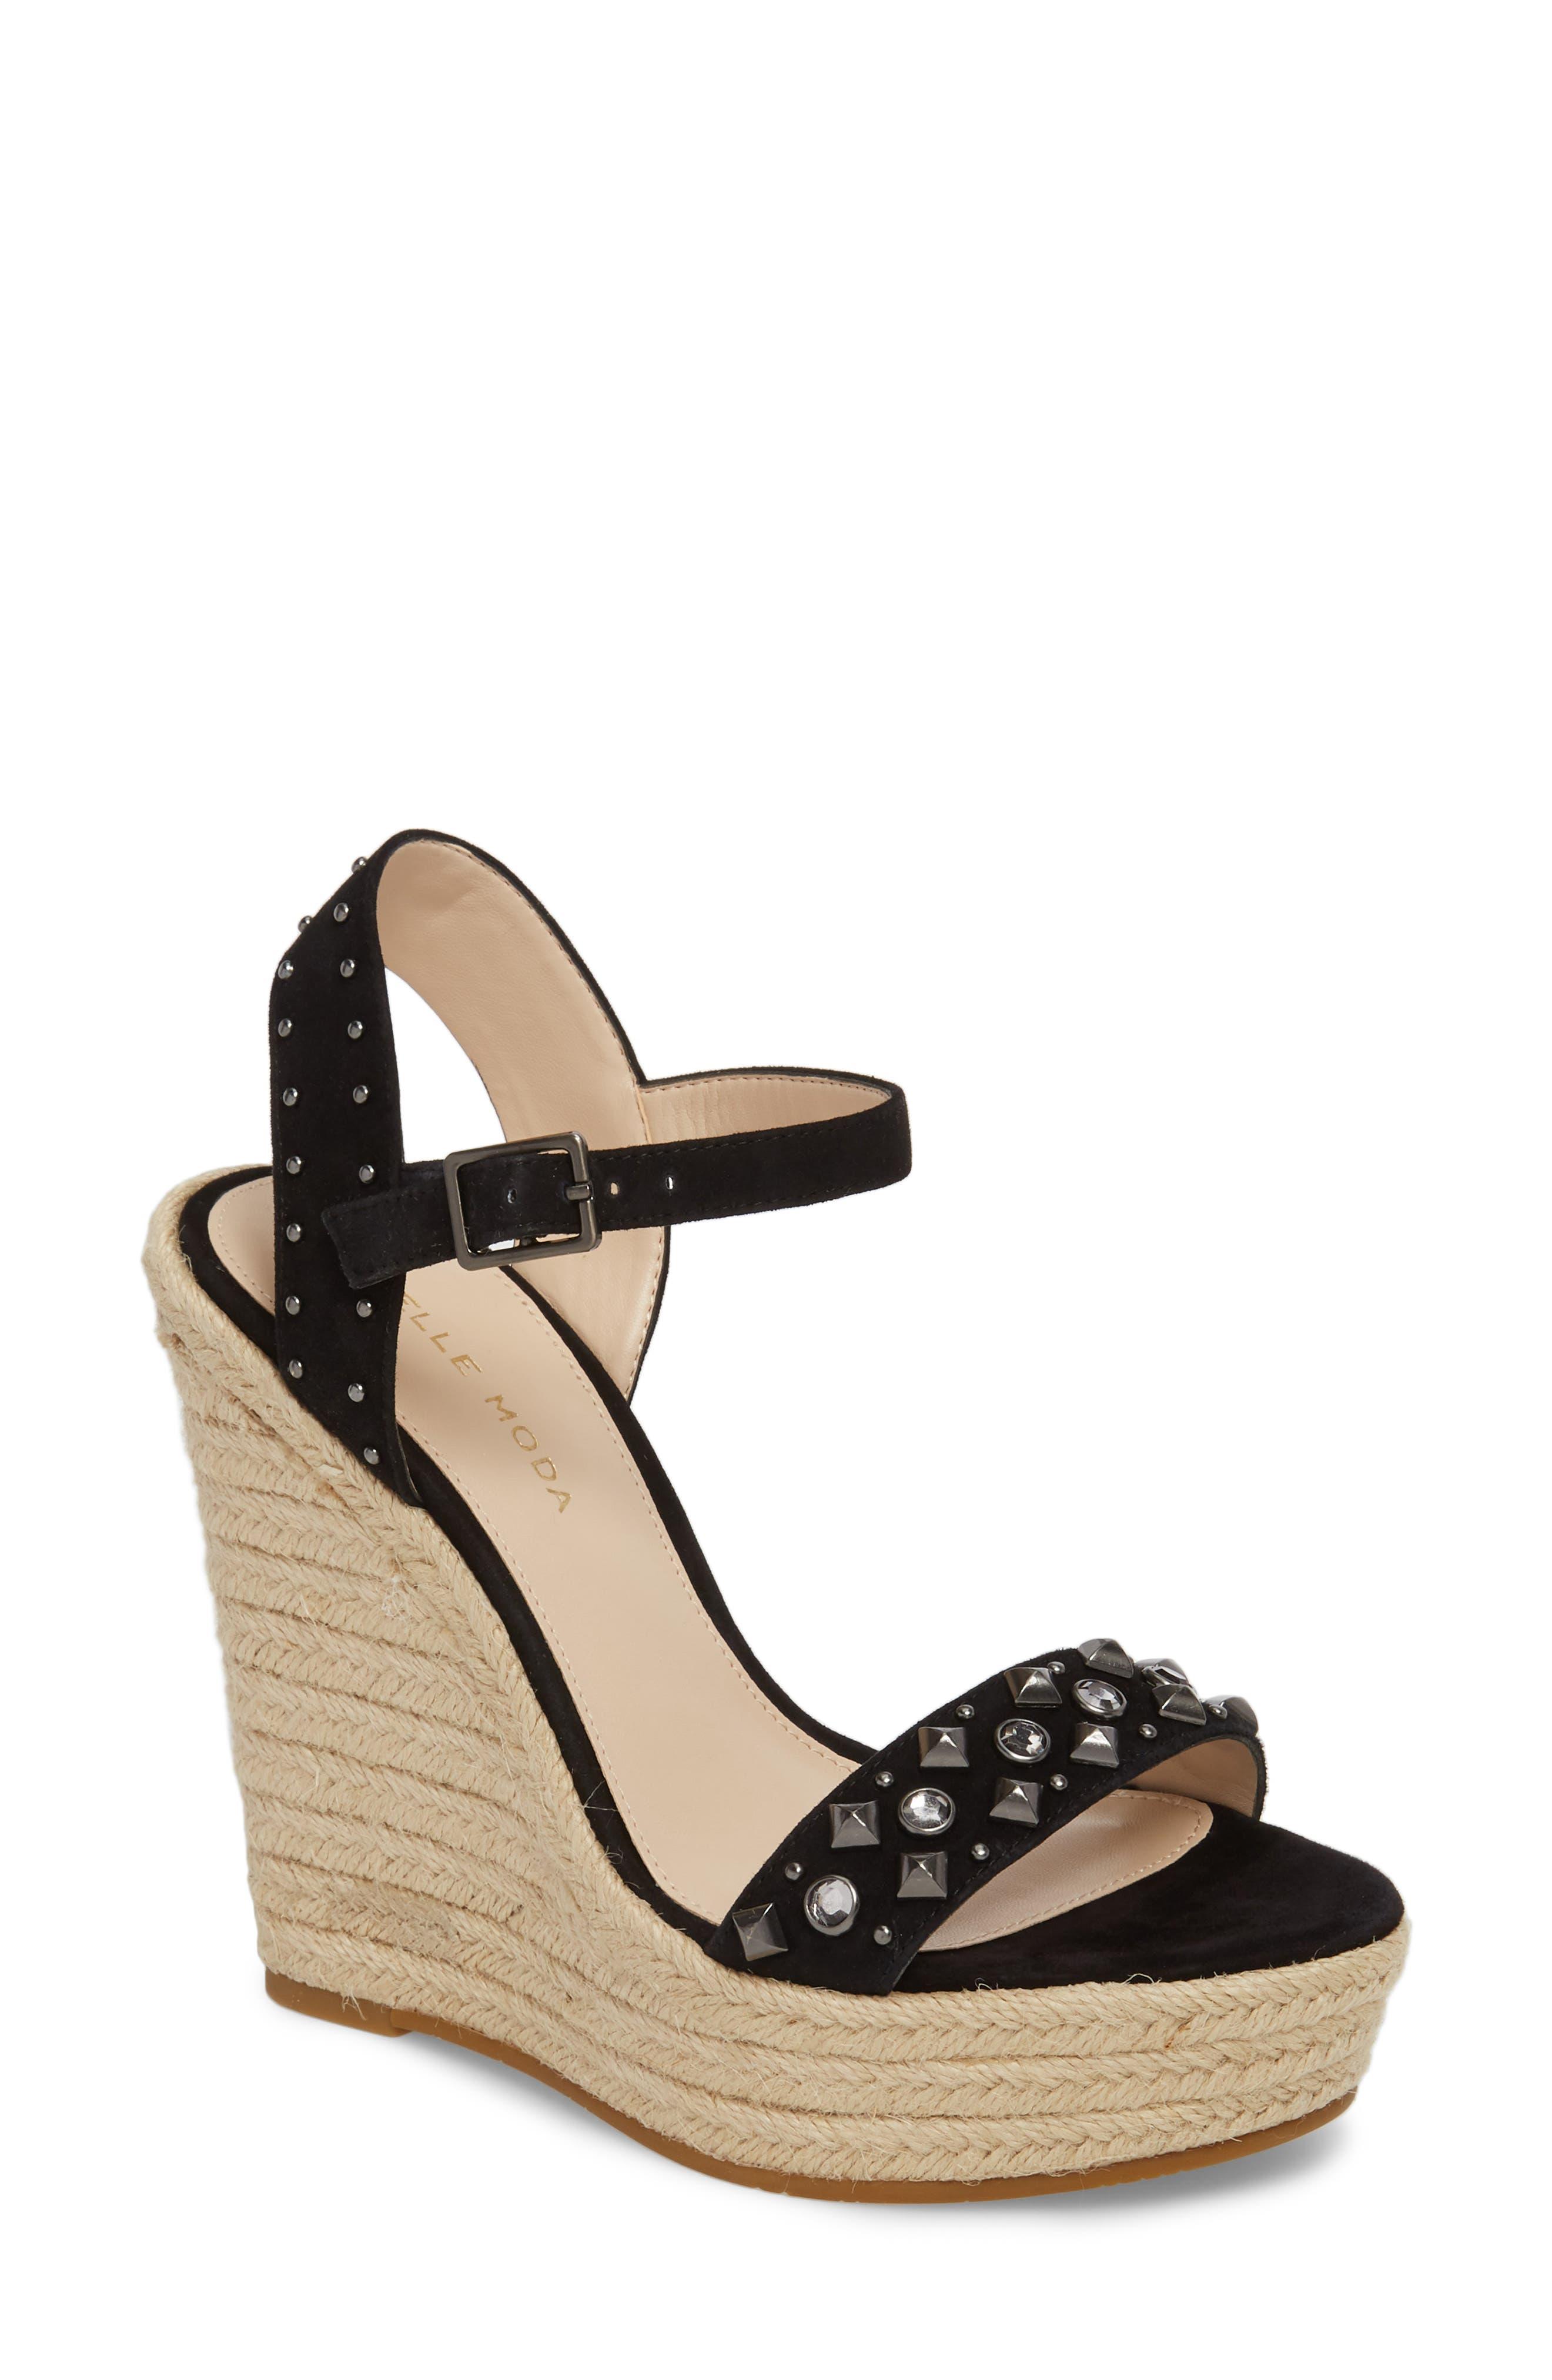 Pelle Moda Oates Espadrille Wedge Sandal (Women)